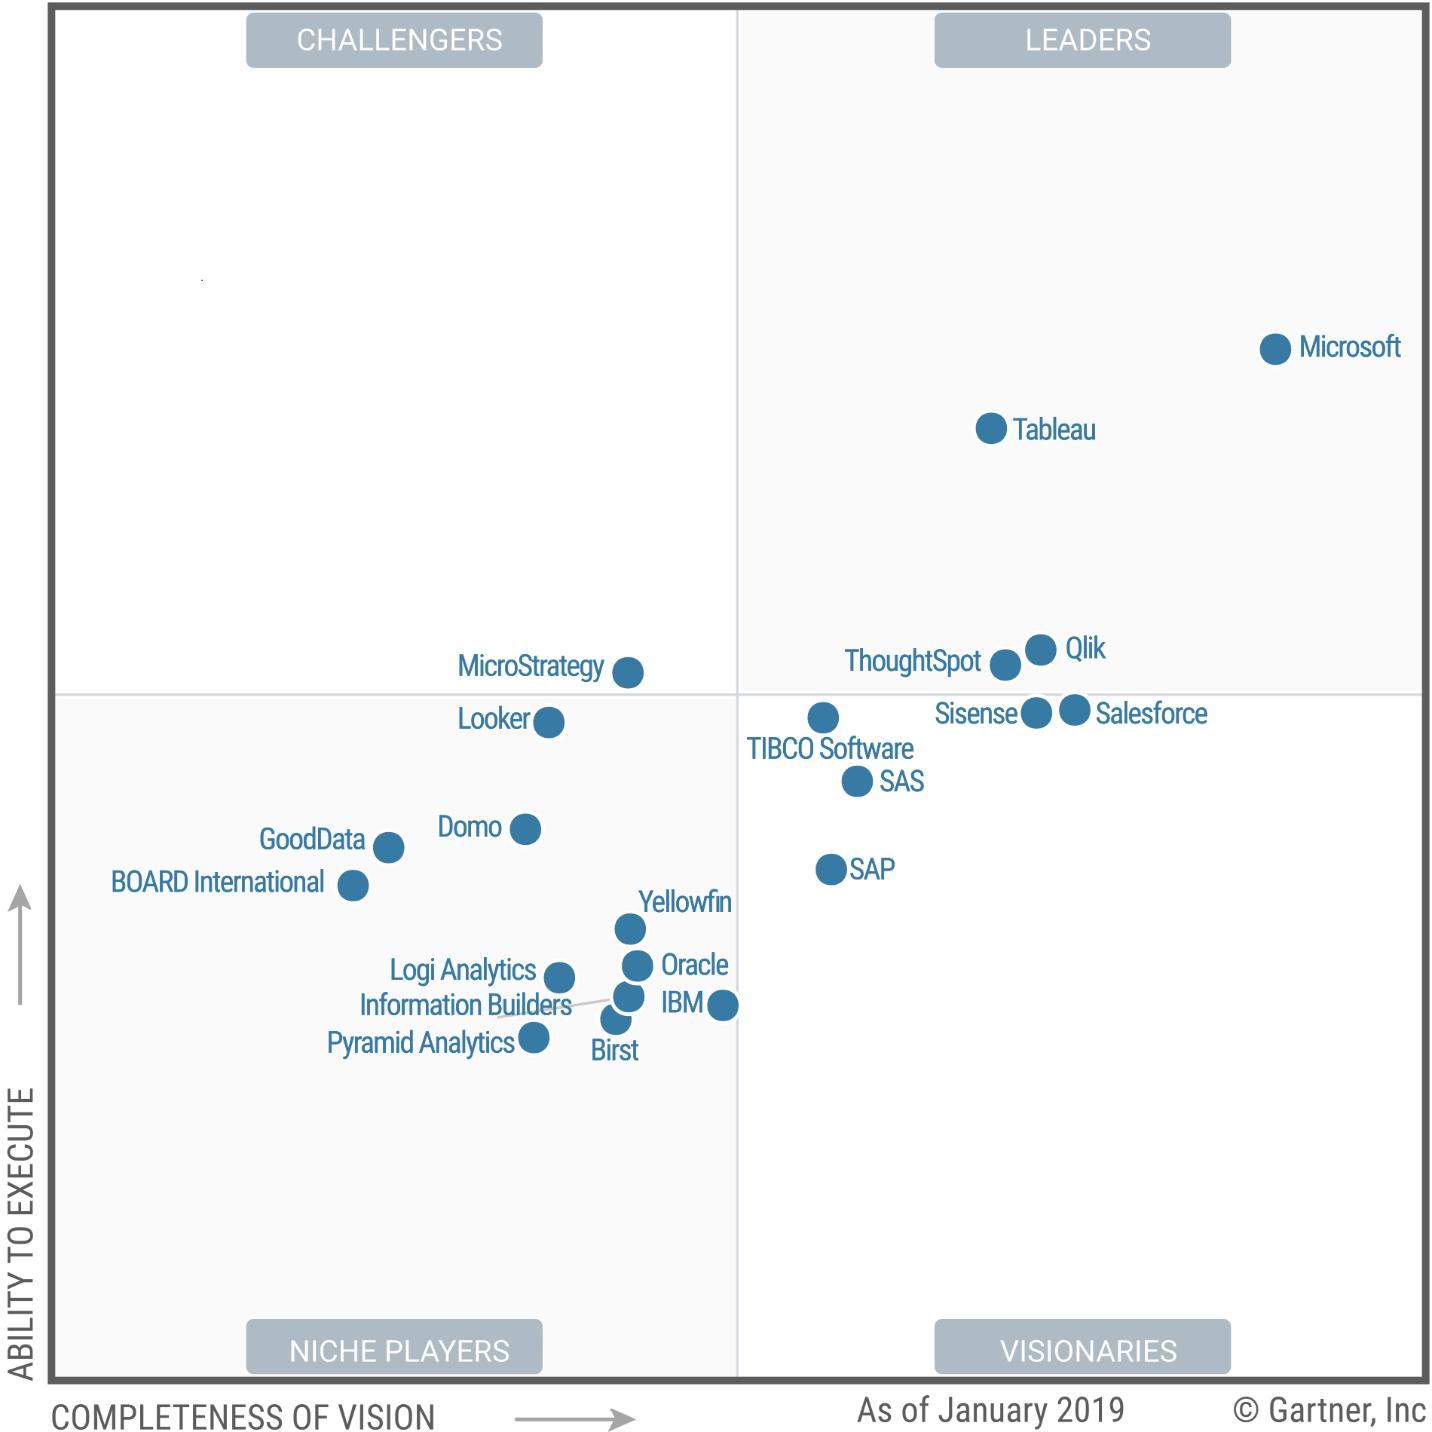 Tableau 'Leader' in Analytics & BI Gartner Magic Quadrant 2019